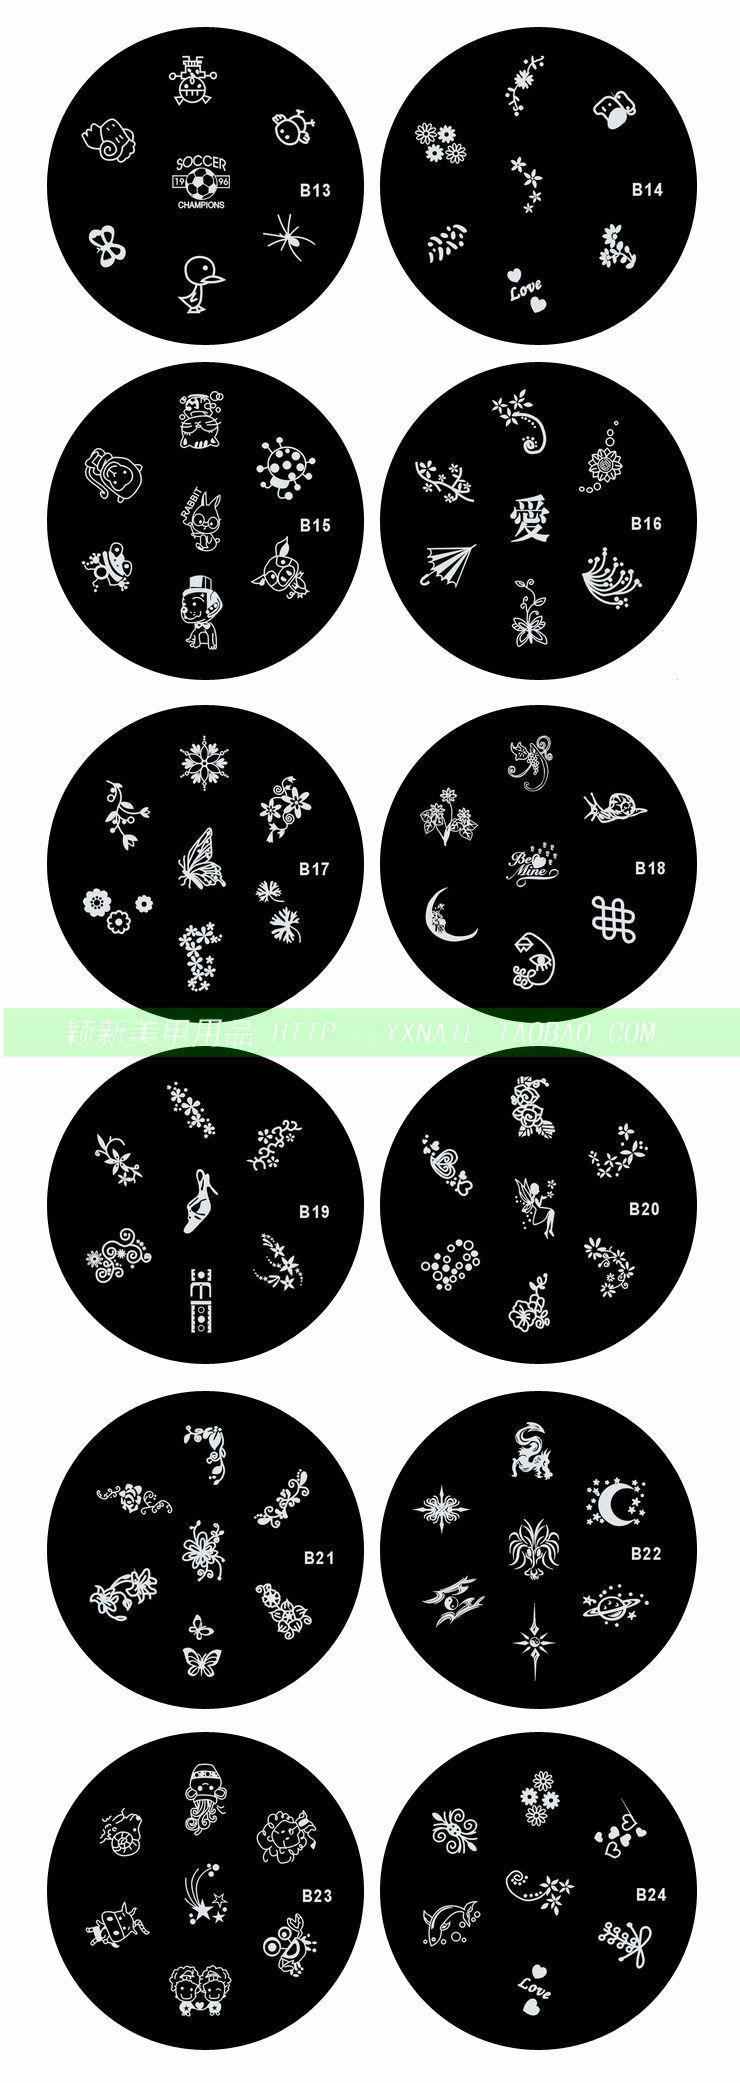 120 Designs Nail art Stamping Stamp Metall Platte Edelstahl Bilddruck Designplatte